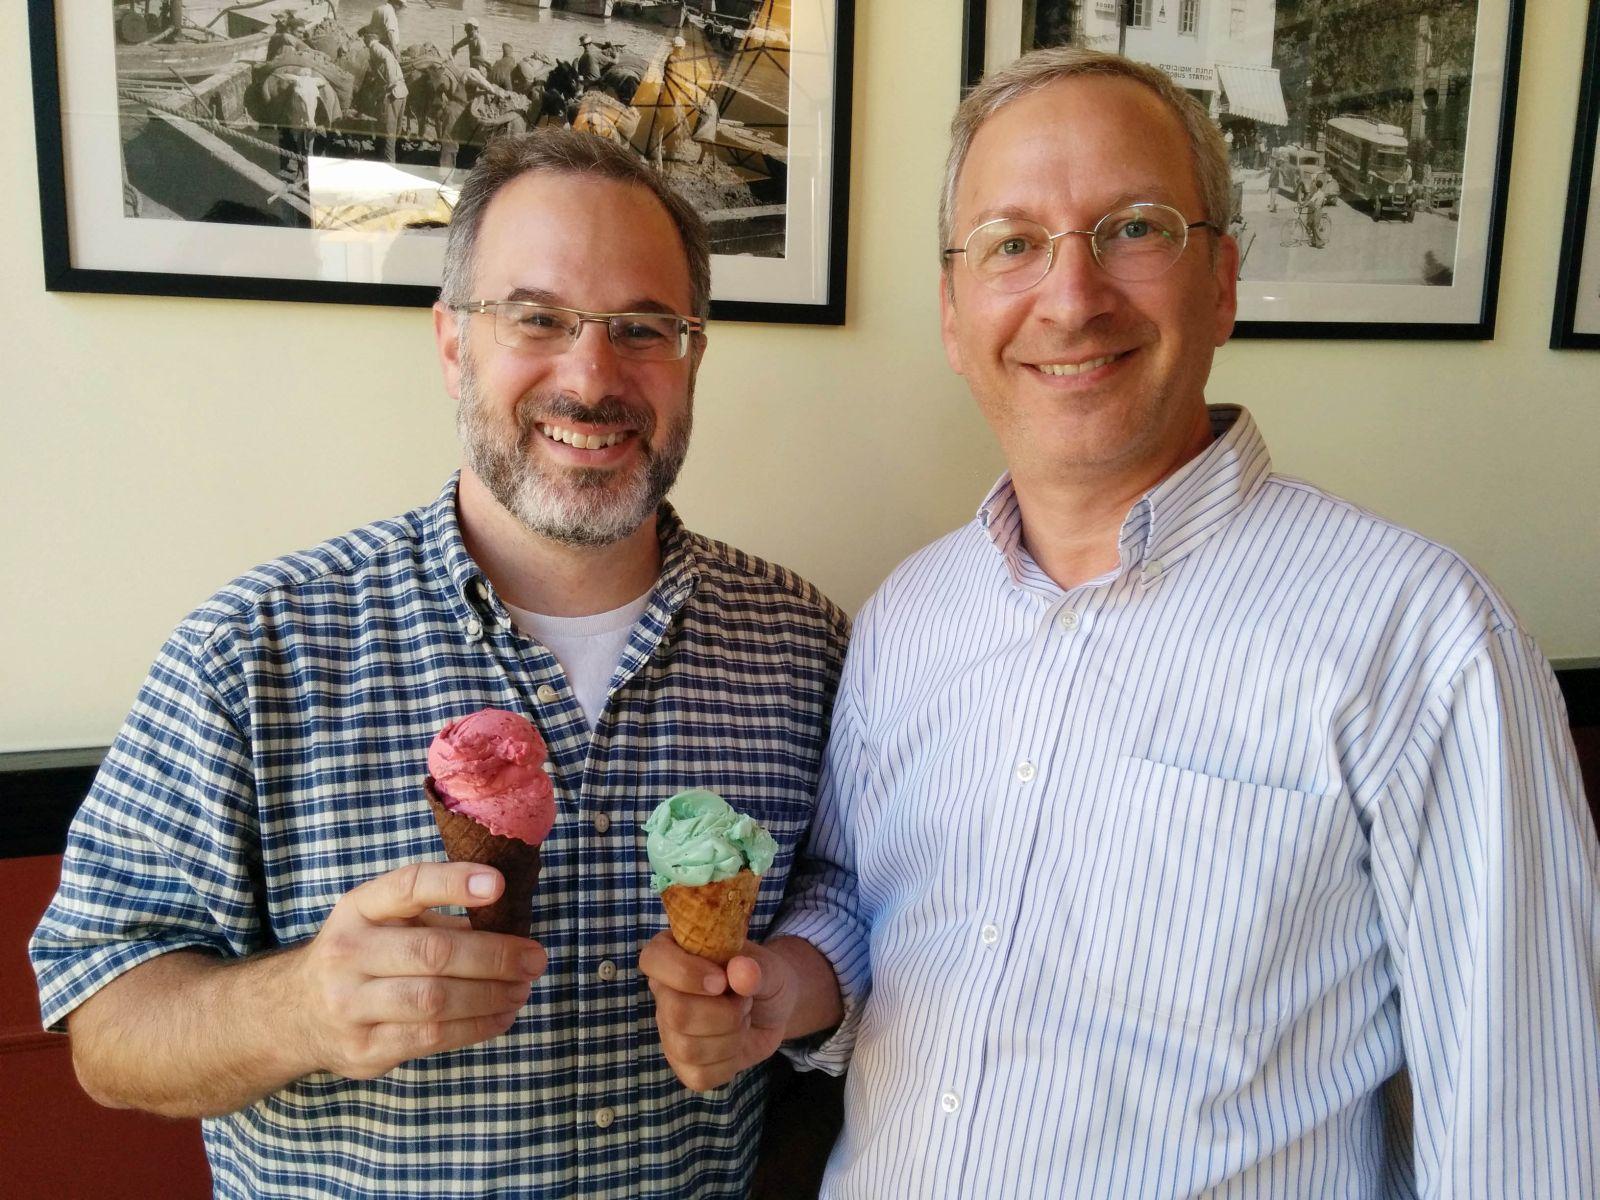 Bisconi cofounders Scott Apfelbaum, right, and David Beker. Photo by Viva Sarah Press